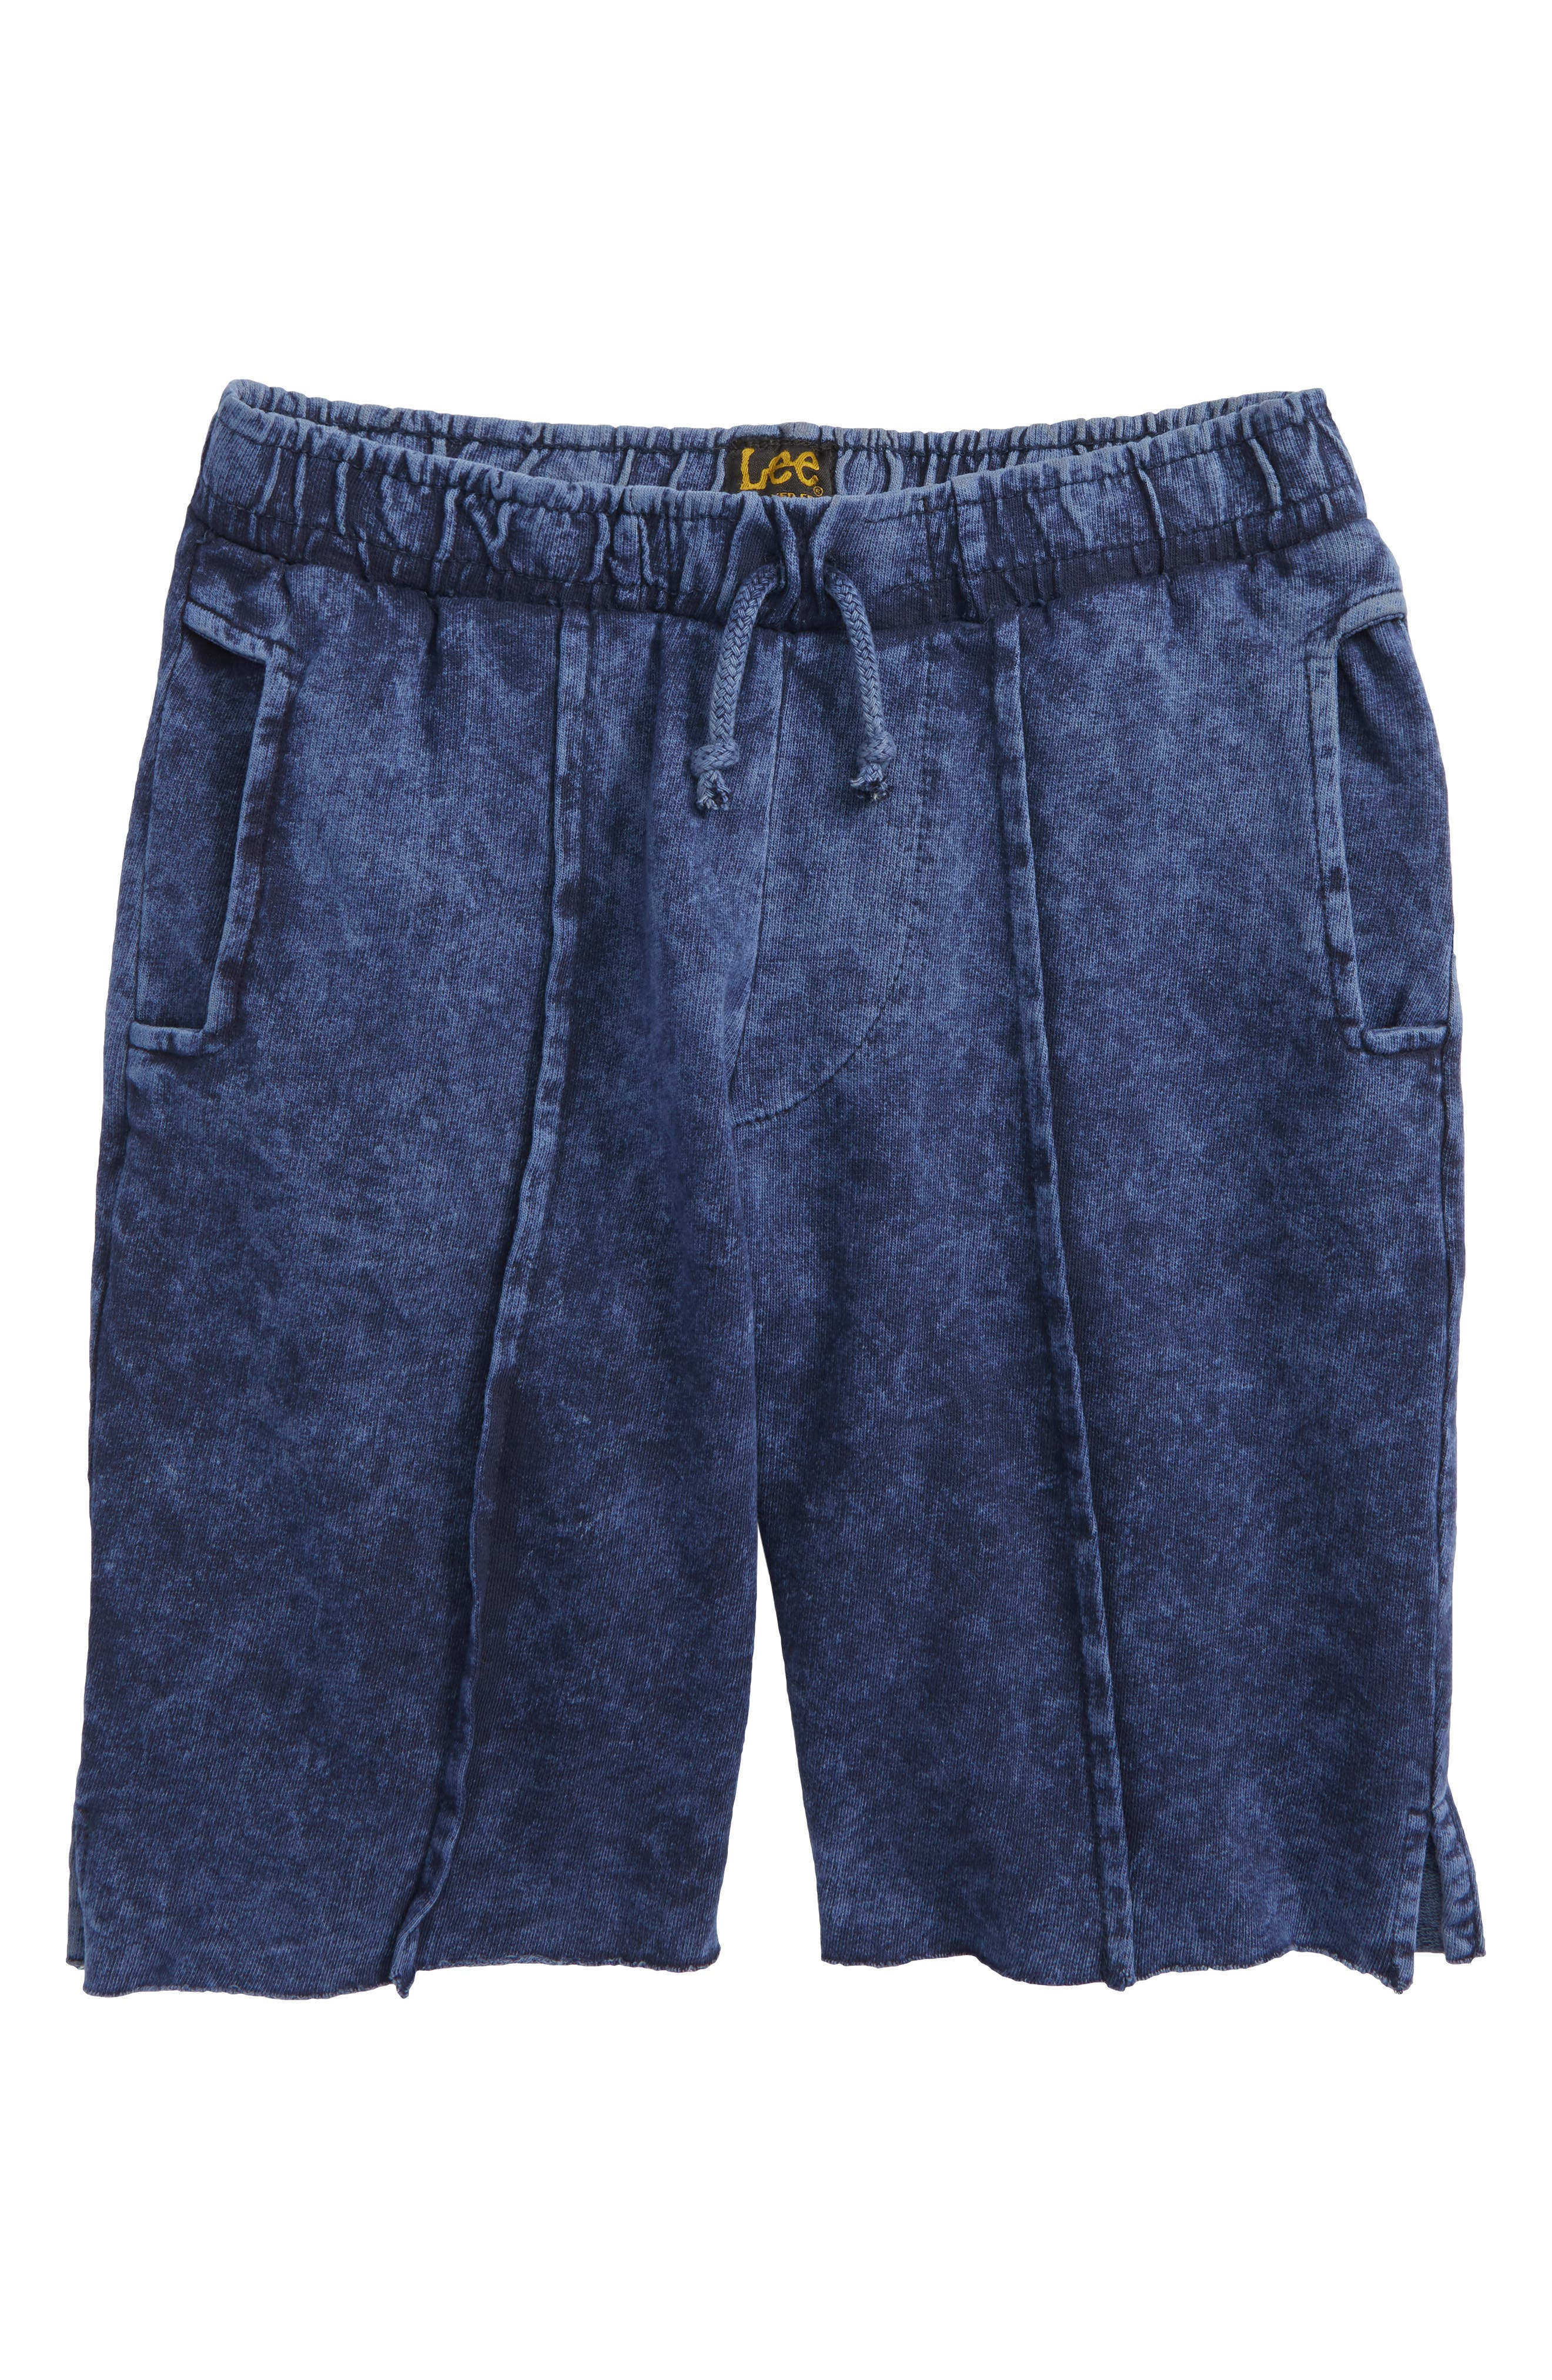 Acid Wash Pull-On Denim Shorts,                             Main thumbnail 1, color,                             Navy